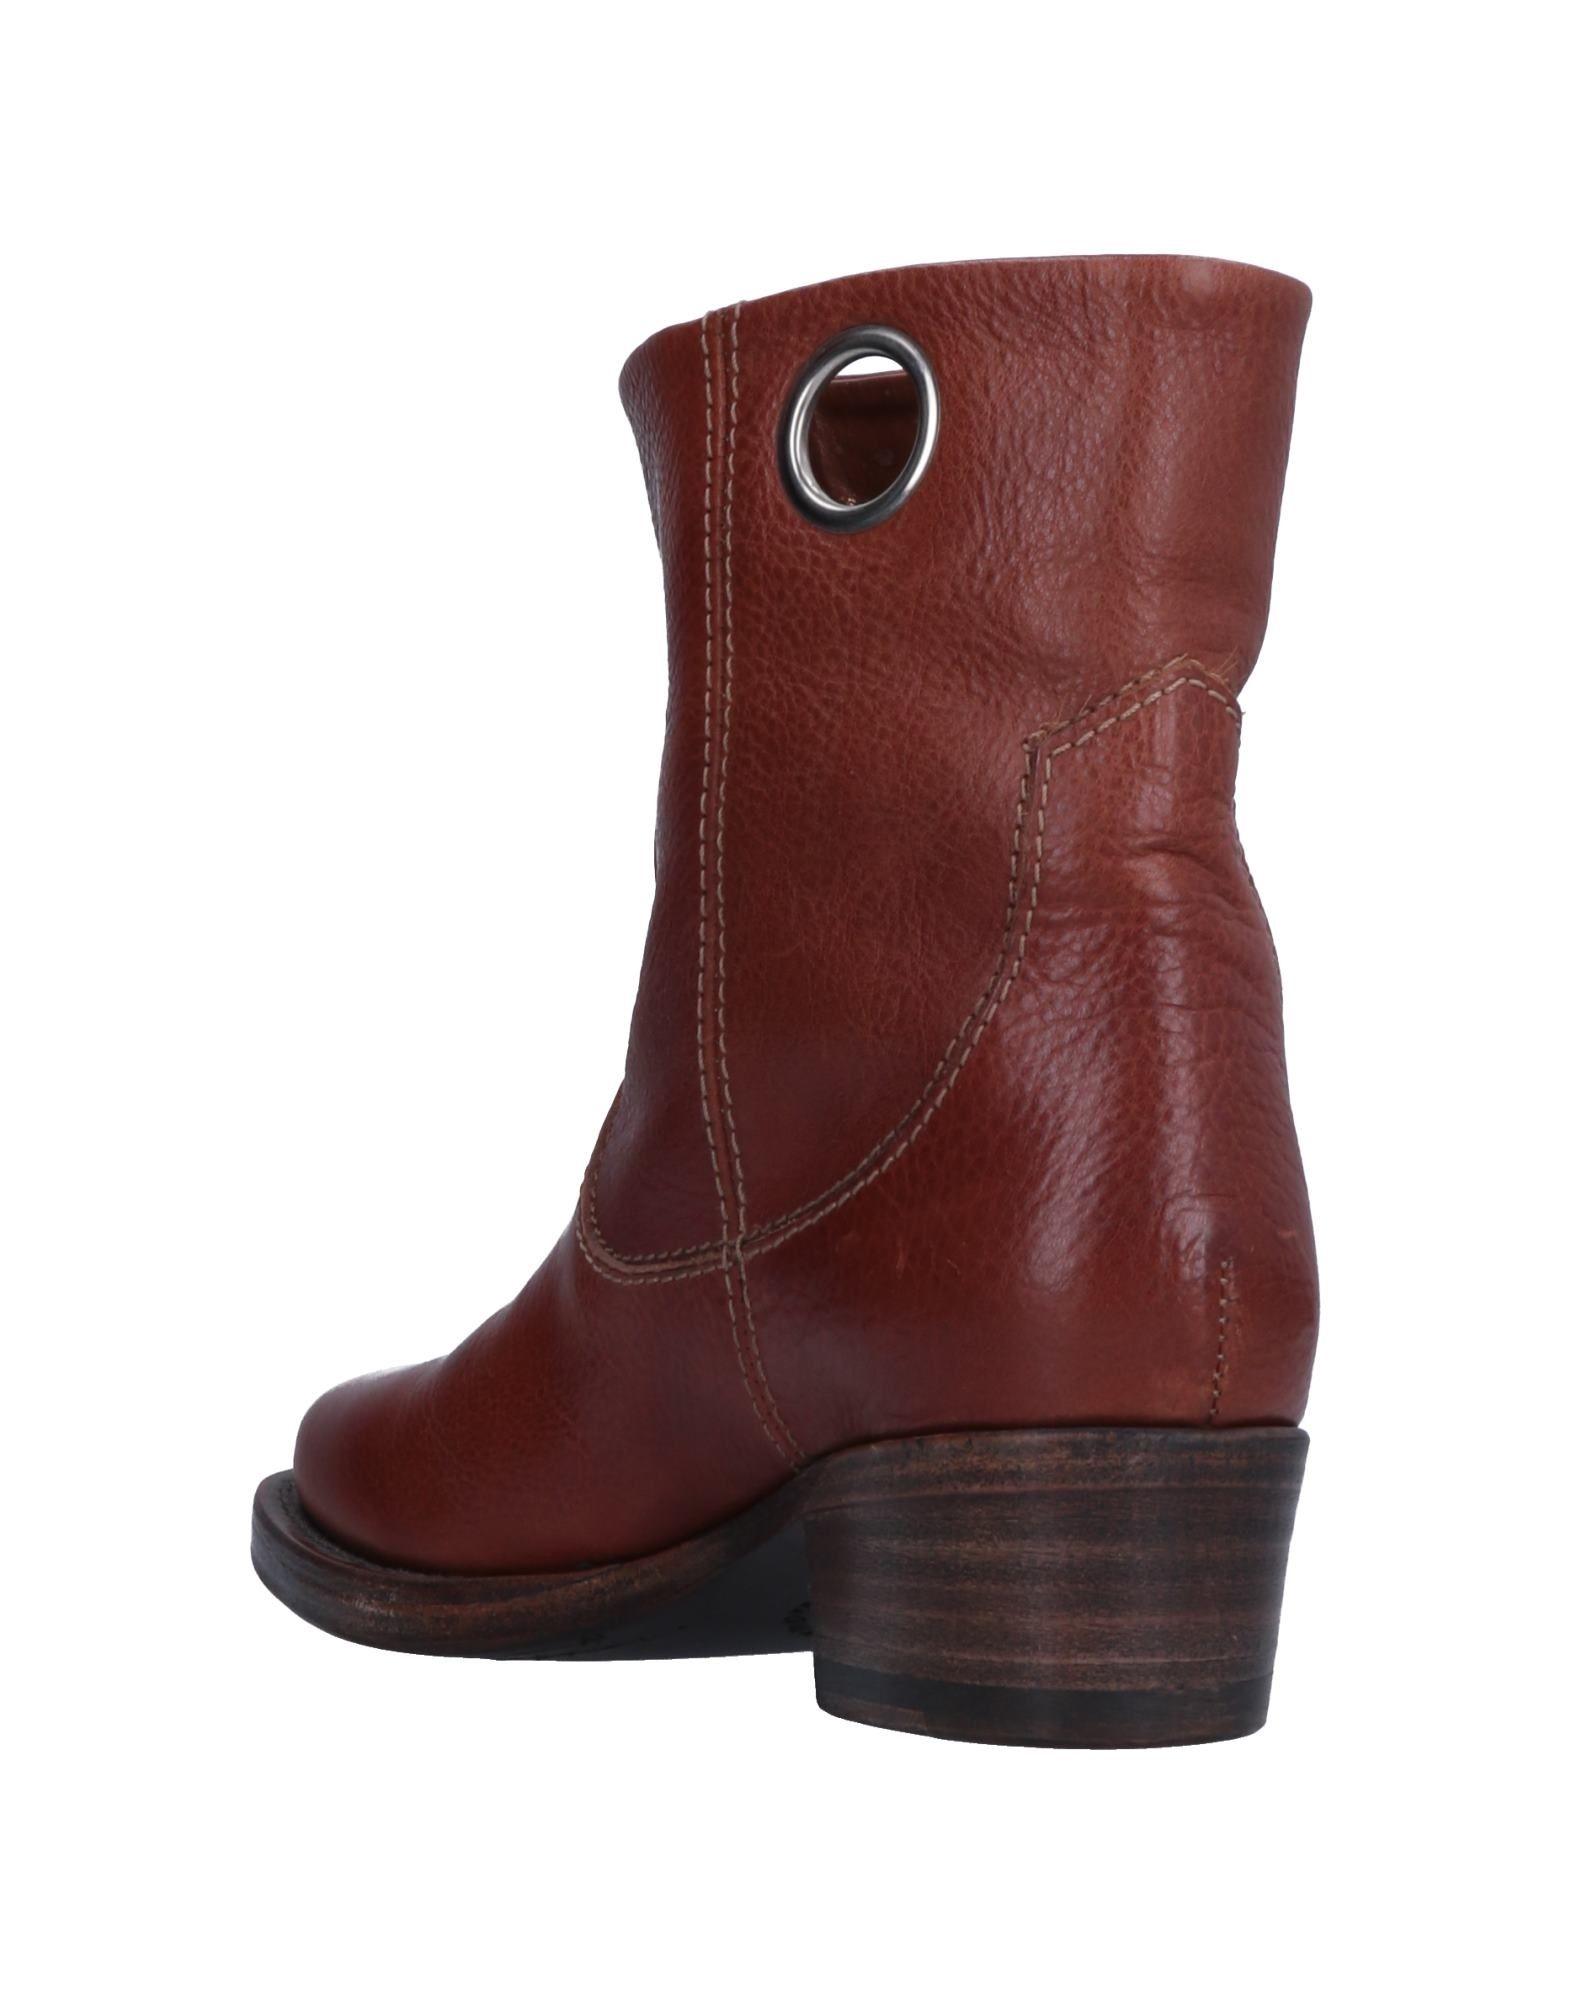 Buttero® Stiefelette strapazierfähige Damen  11553007LJGut aussehende strapazierfähige Stiefelette Schuhe 9052fb